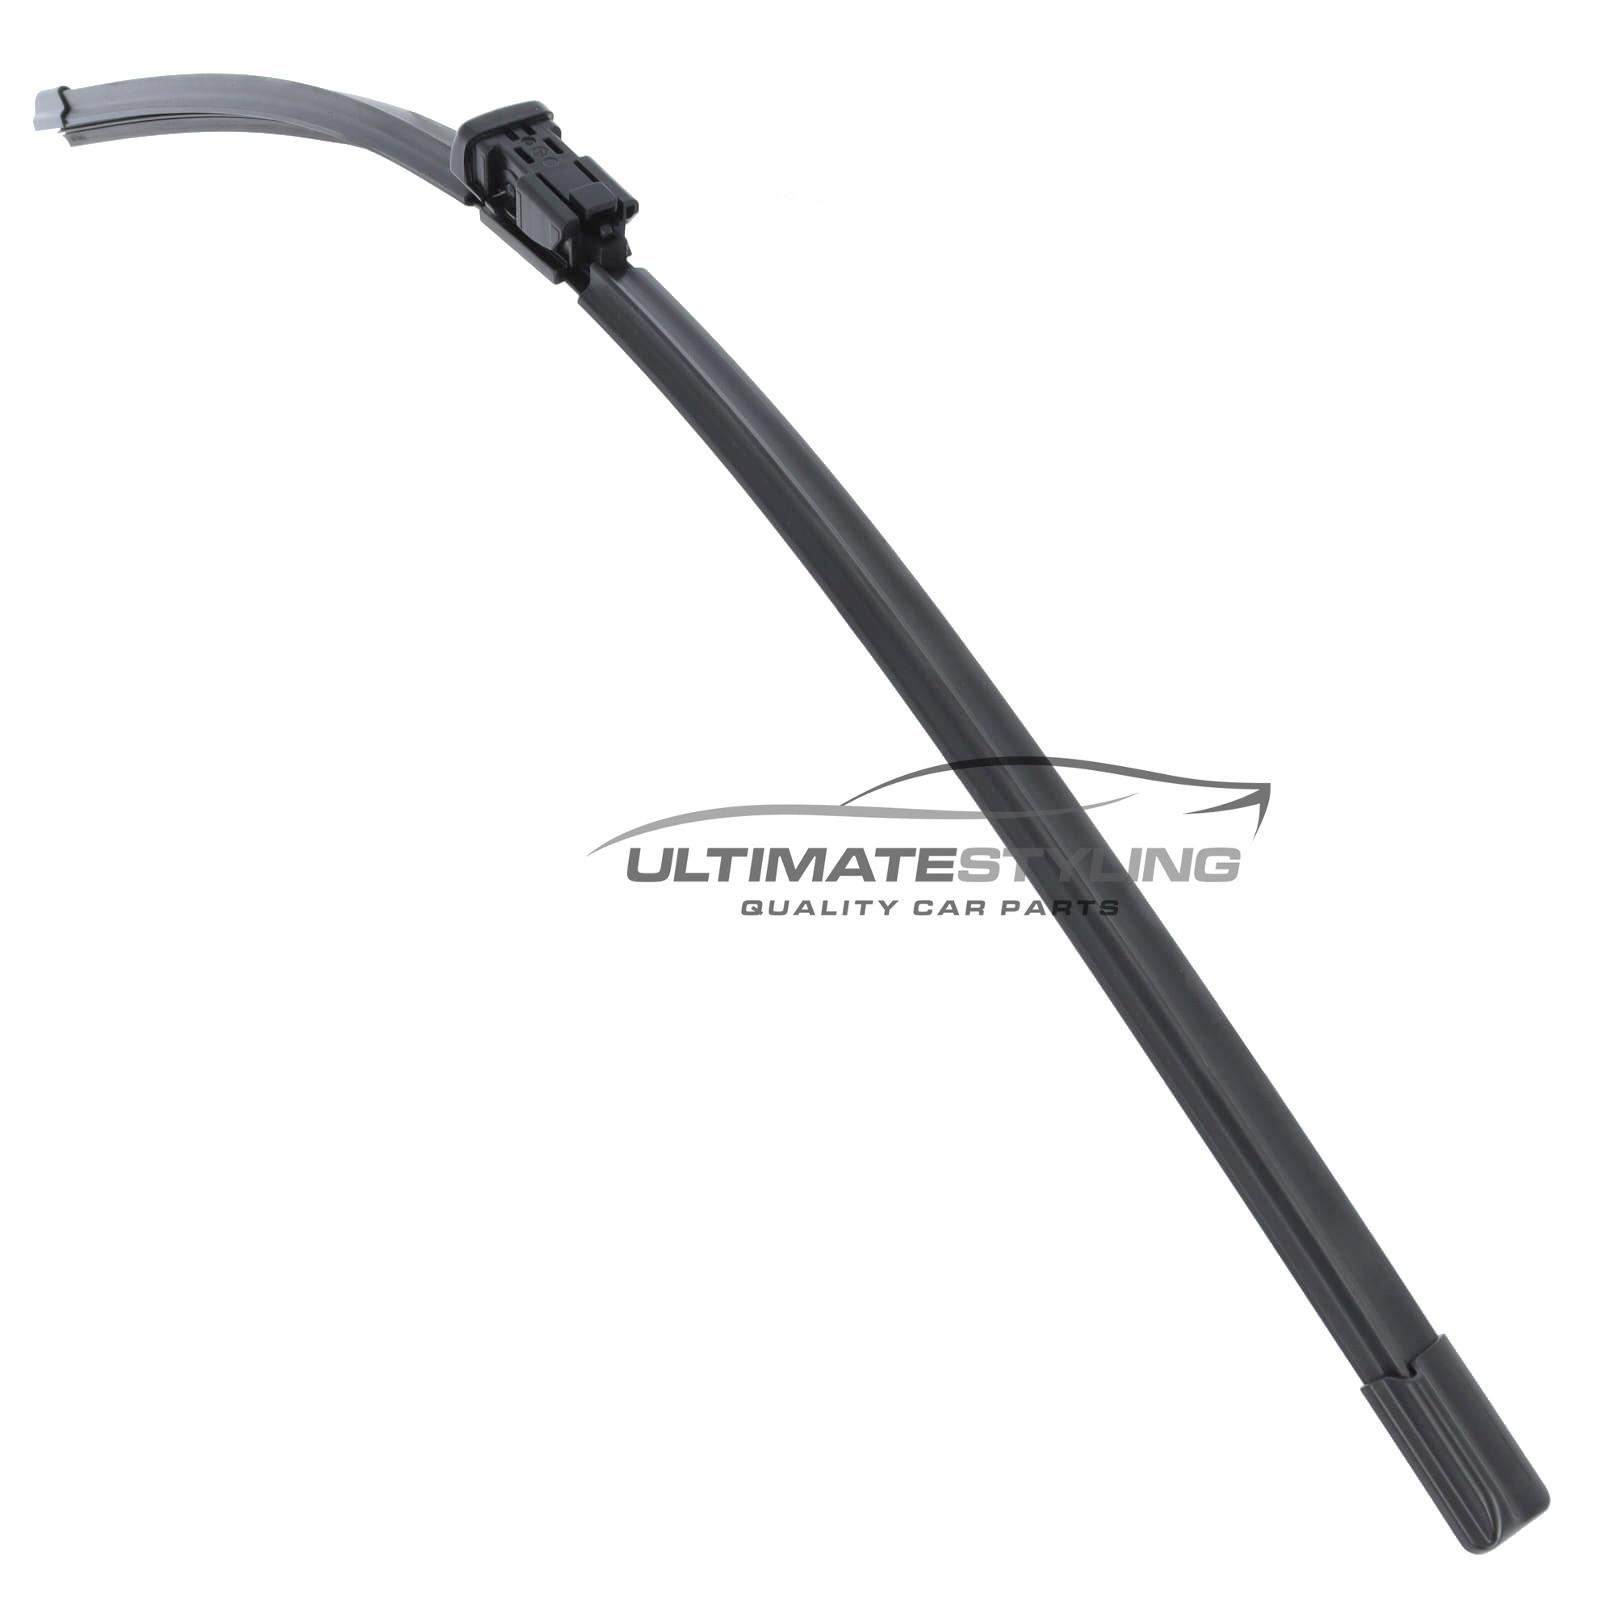 Wiper Blade - Exact Fit Aero Blade - 65 cm - 26 inch - Multi Fitment